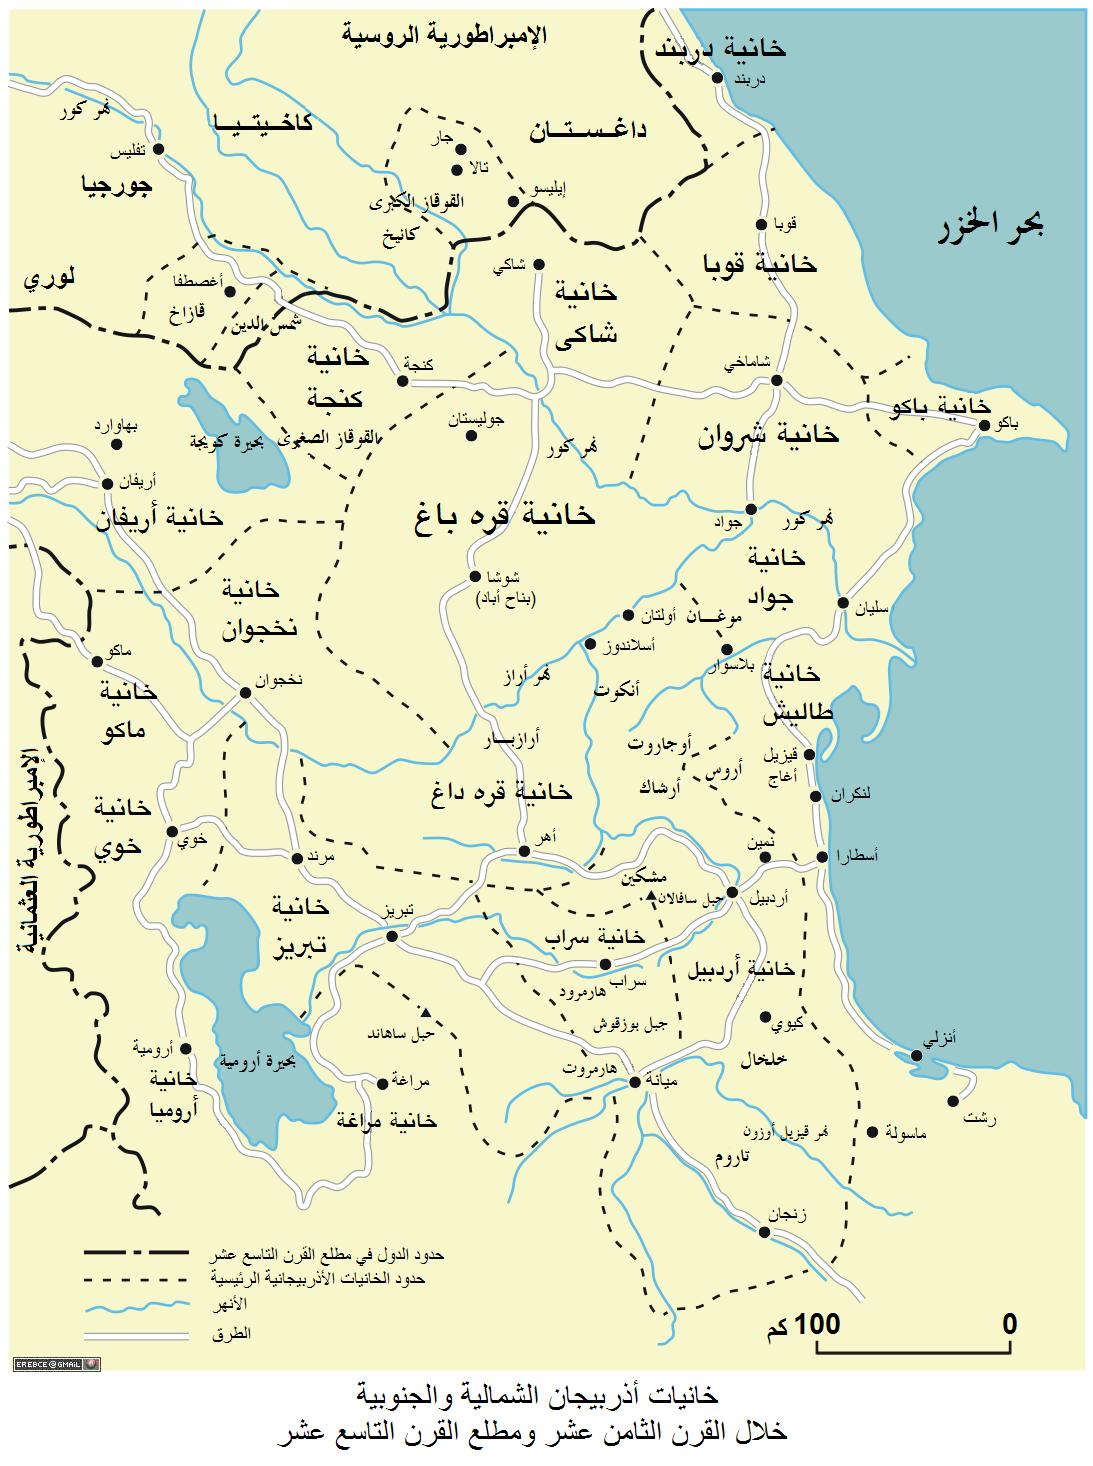 Картинки по запросу خارطة أذربيجات للقرون الوسطى